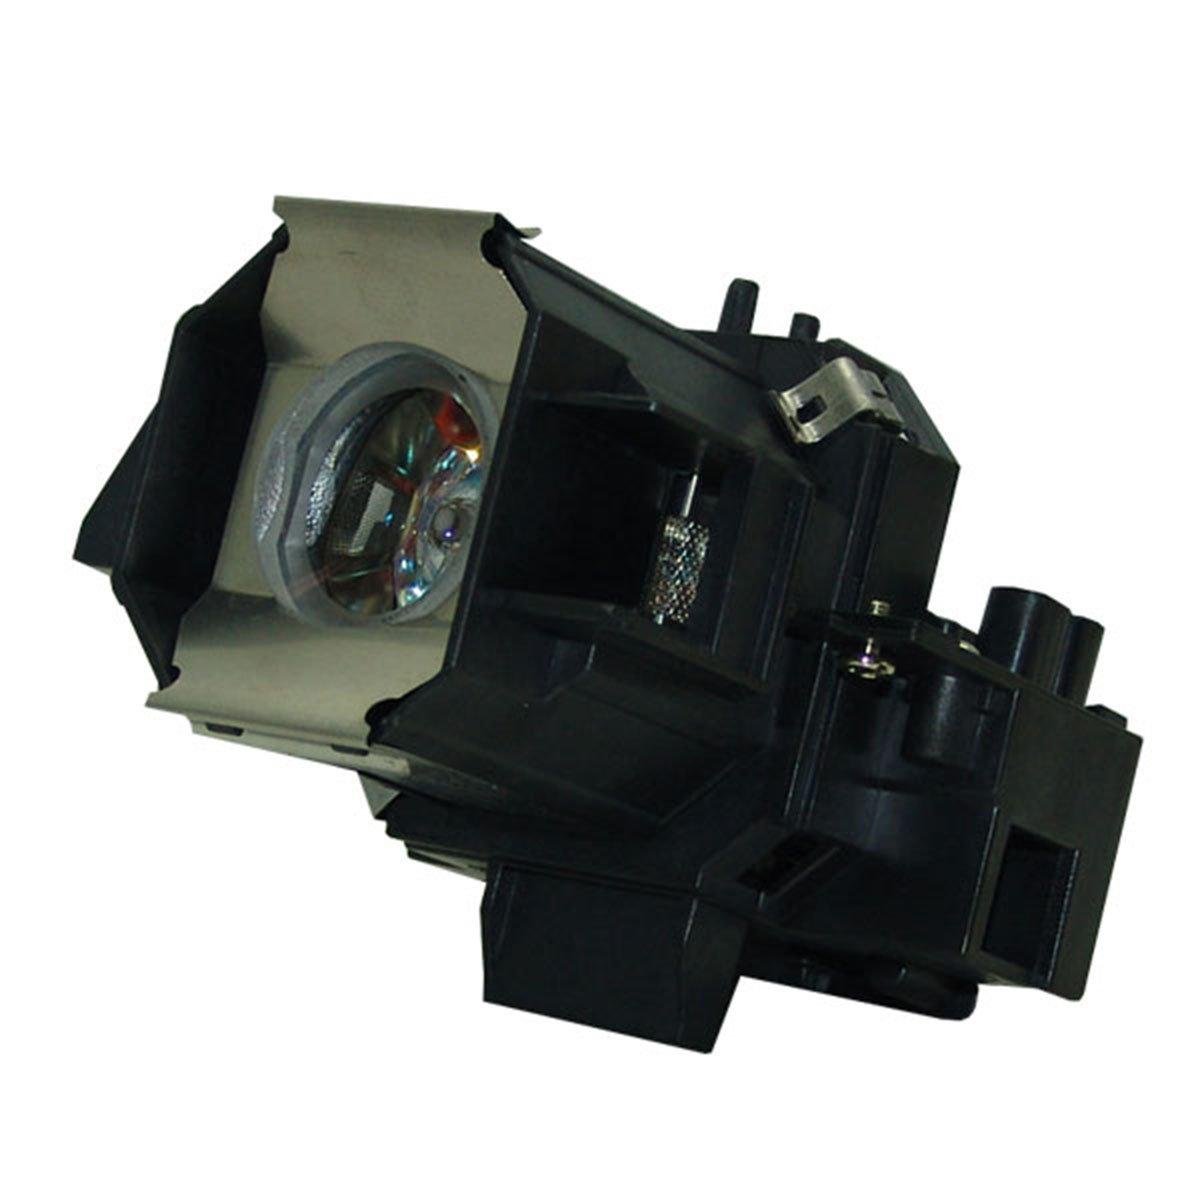 Lutema OEM プロジェクター交換用ランプ ハウジング/電球付き Epson Ensemble HD 1080用 Economy Economy Lamp with Housing B07KTKL113